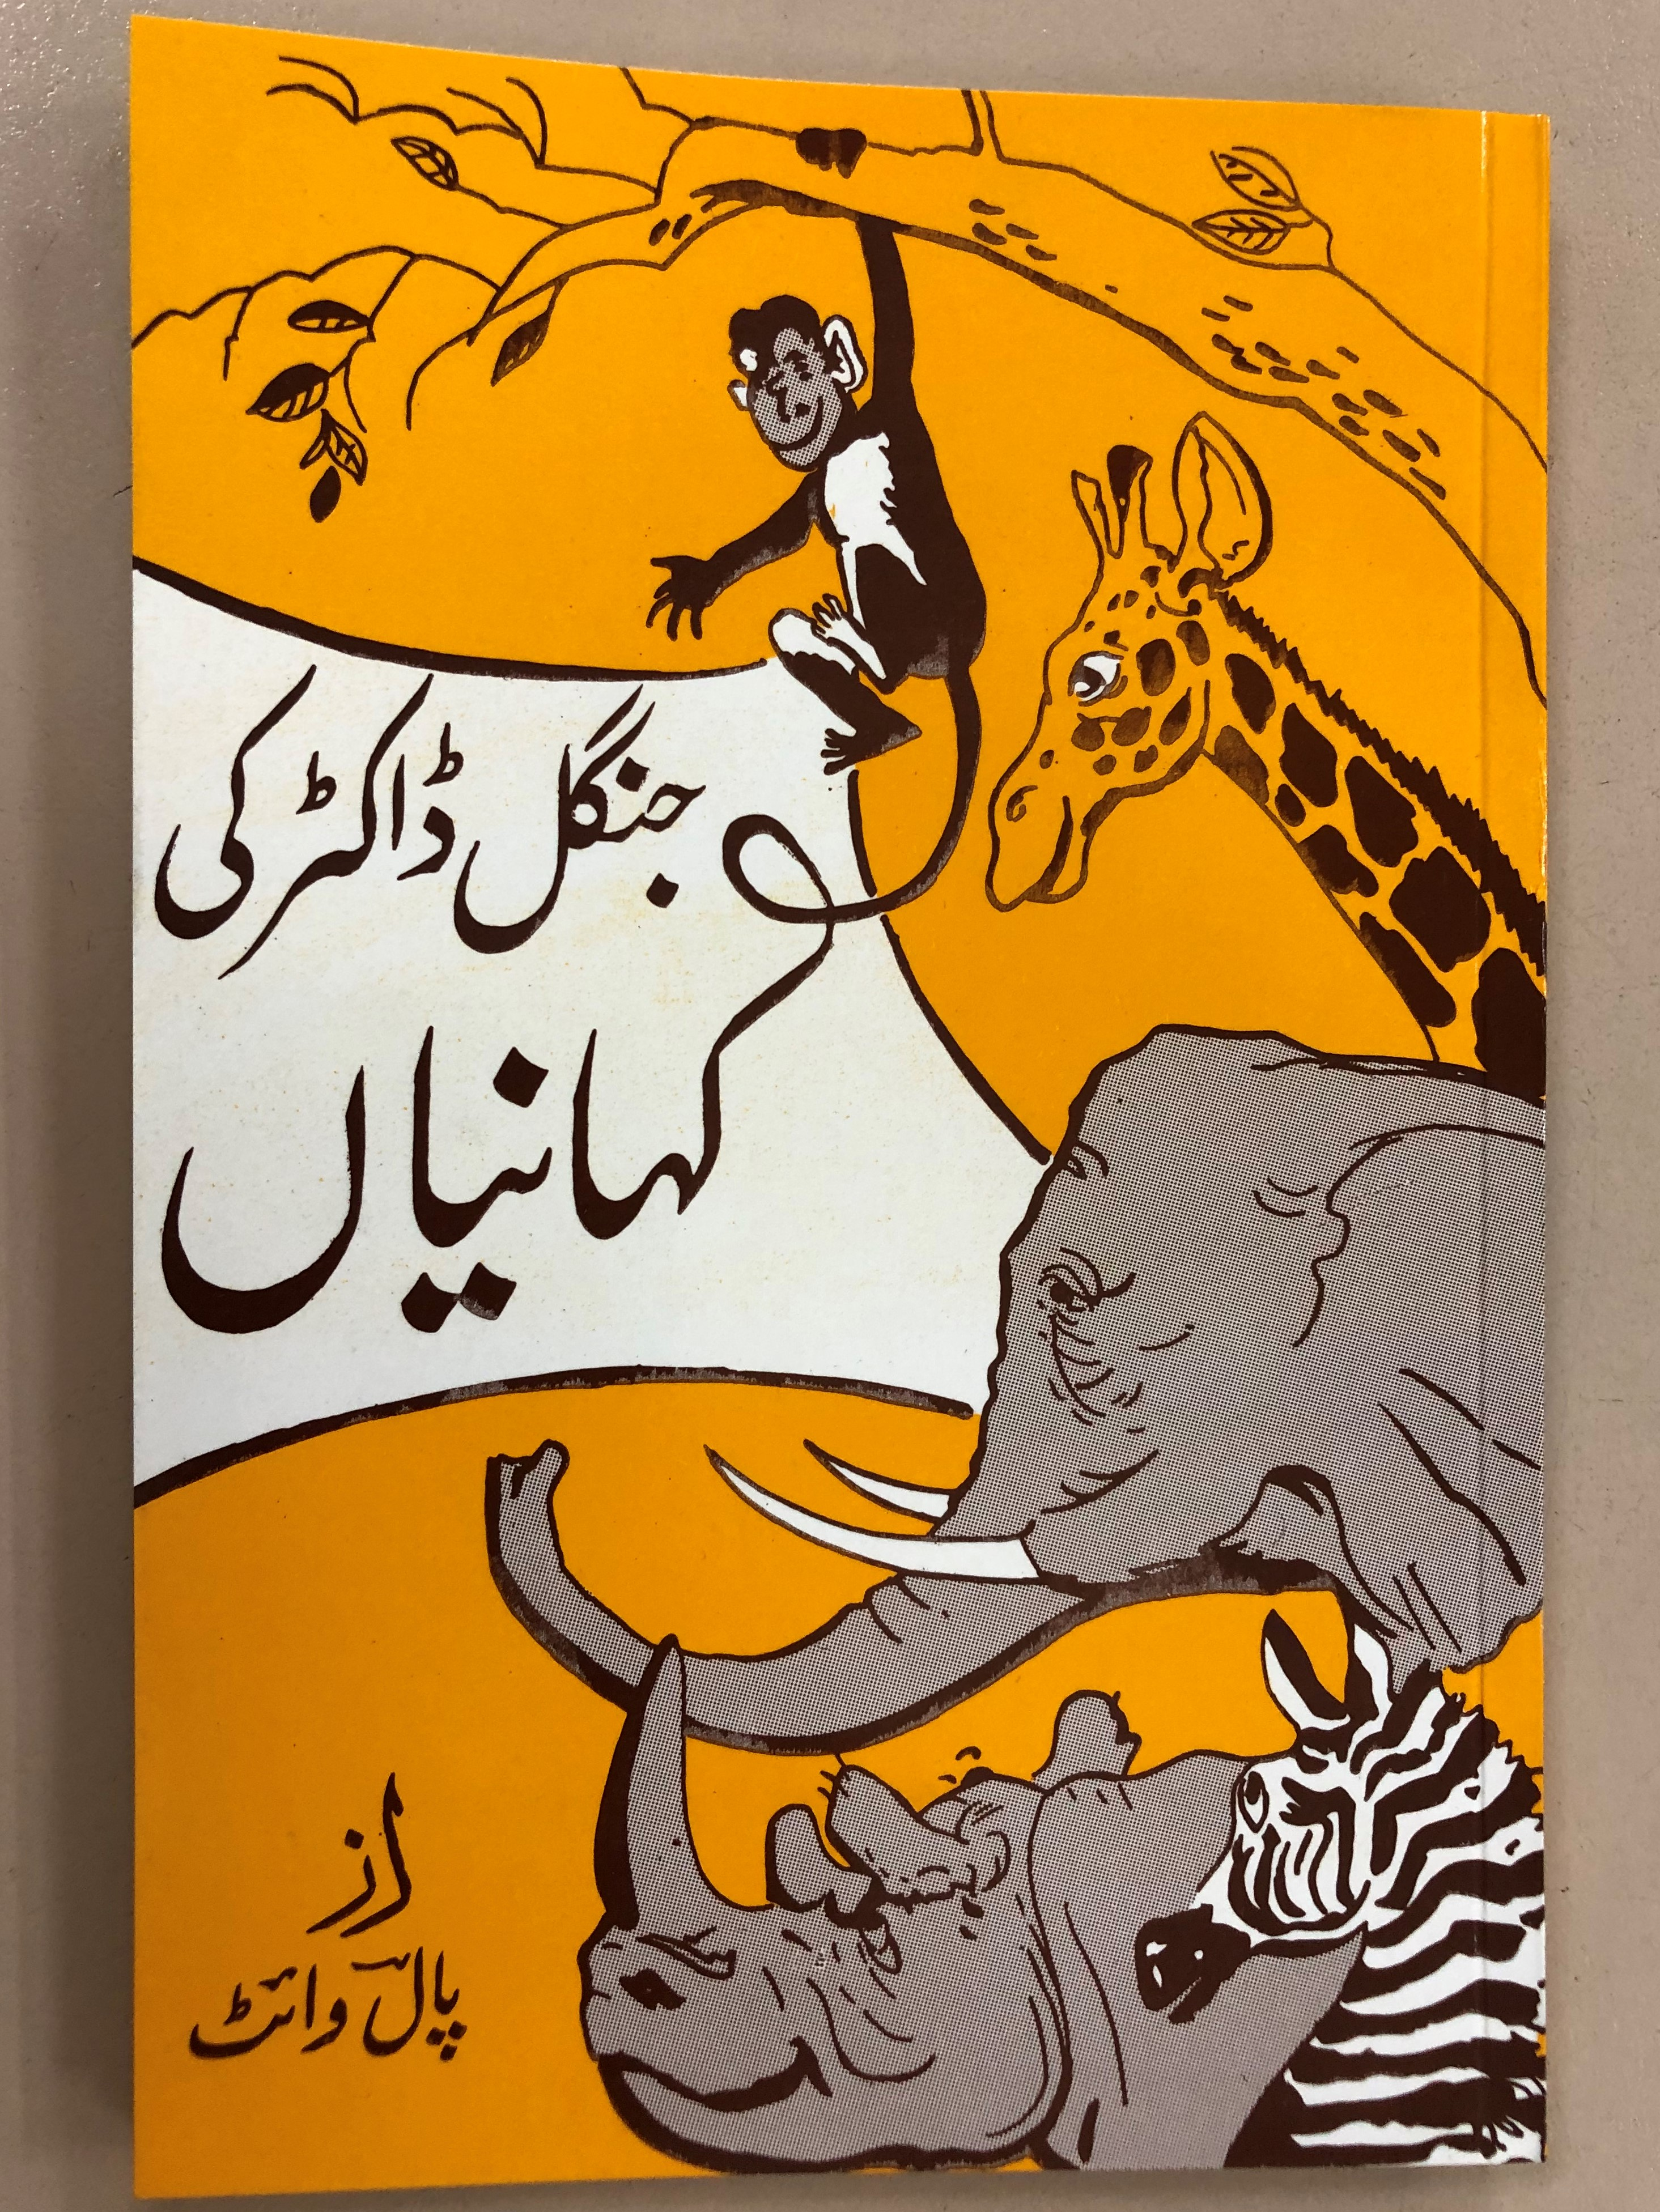 animal-stories-in-urdu-language-paperback-2018-masihi-isha-at-khana-brilliantly-written-animal-stories-with-a-forceful-spiritual-message-1-.jpg